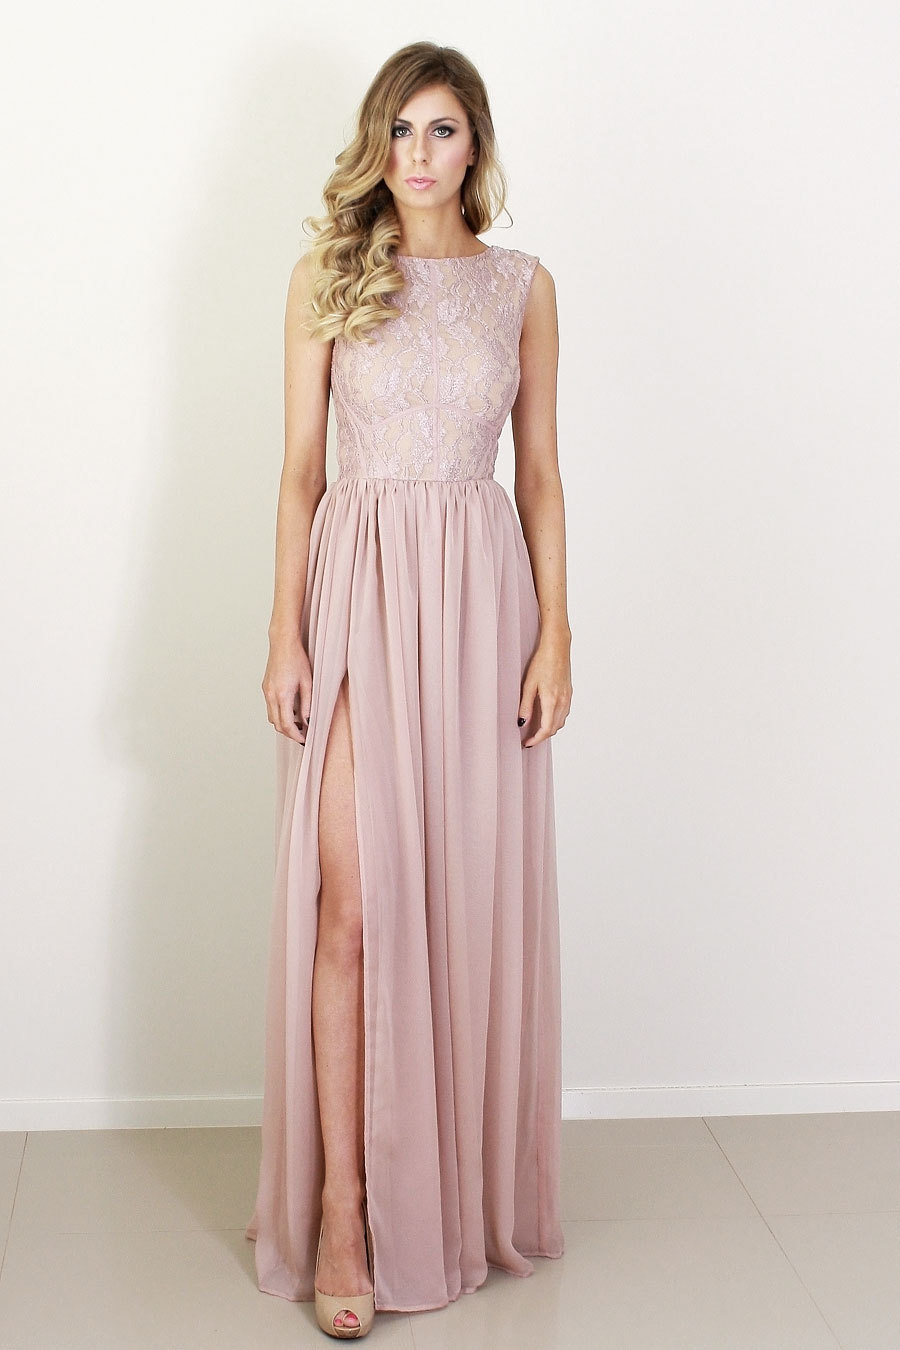 Dusty pink bridesmaid dress dress, modest bridesmaid dress, chiffon ...